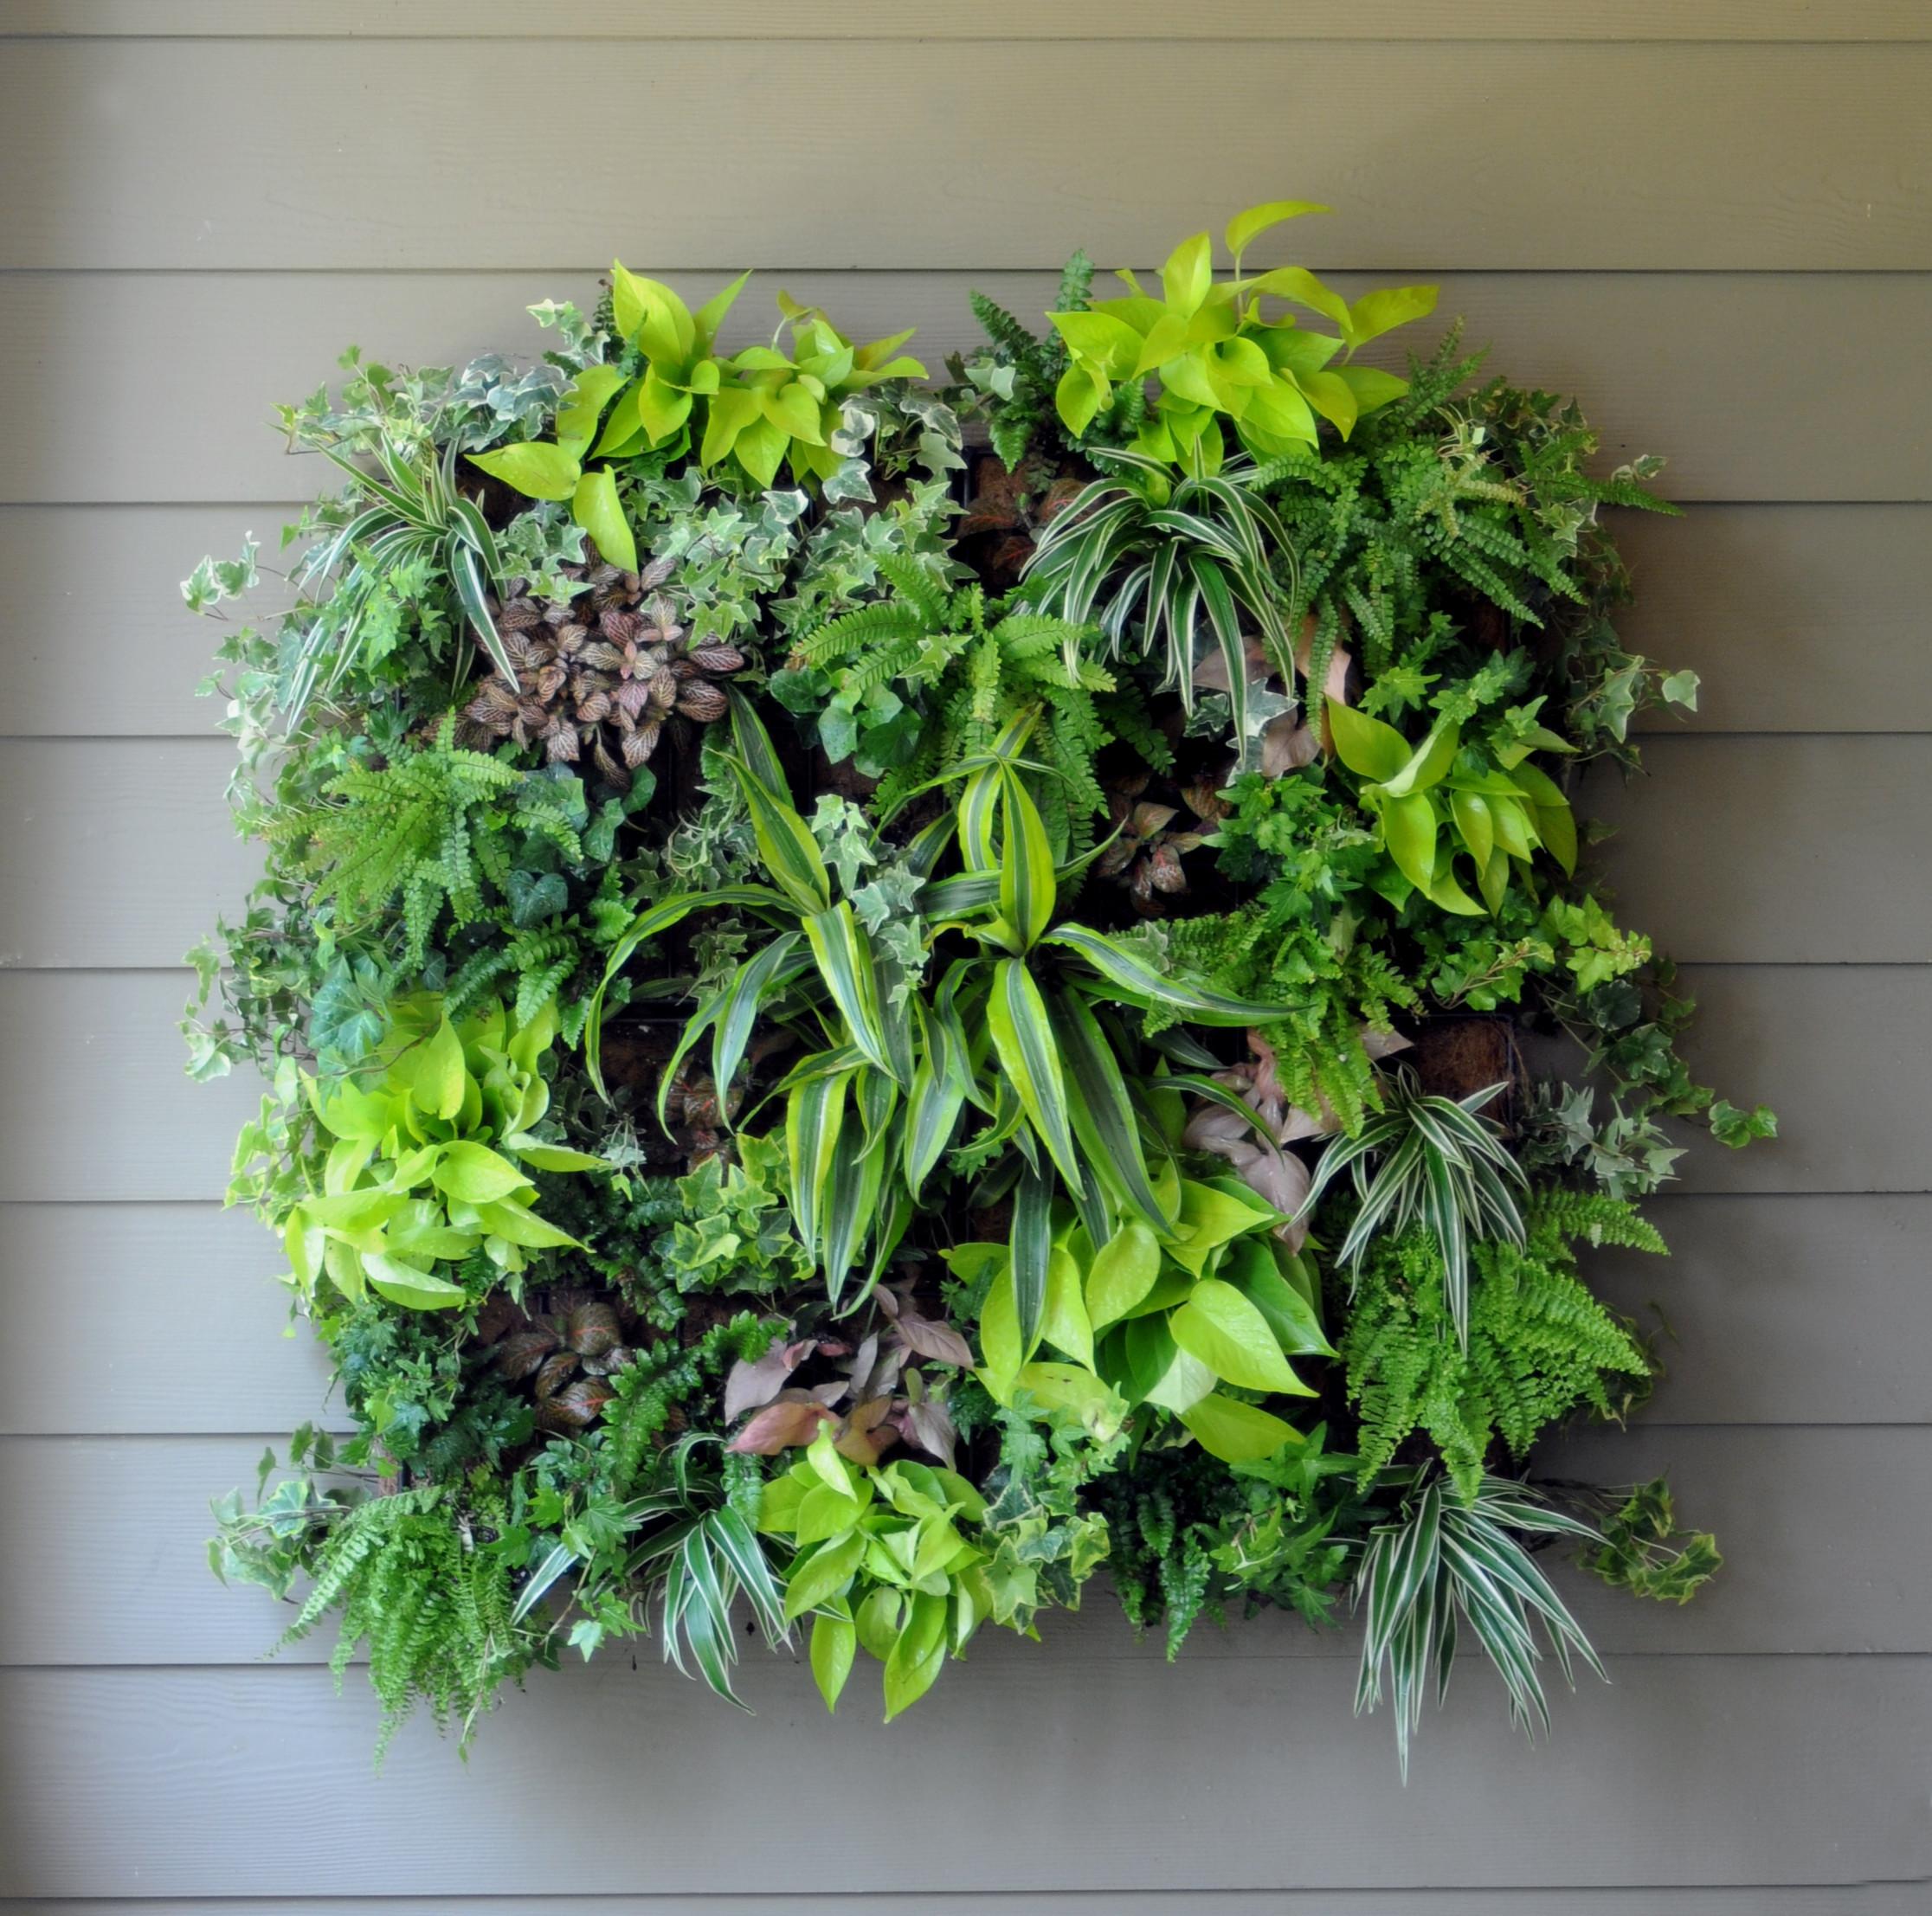 hanging glass rooting vases of kinsman garden everedge lawn edging gardening in 2661 2578 thumb